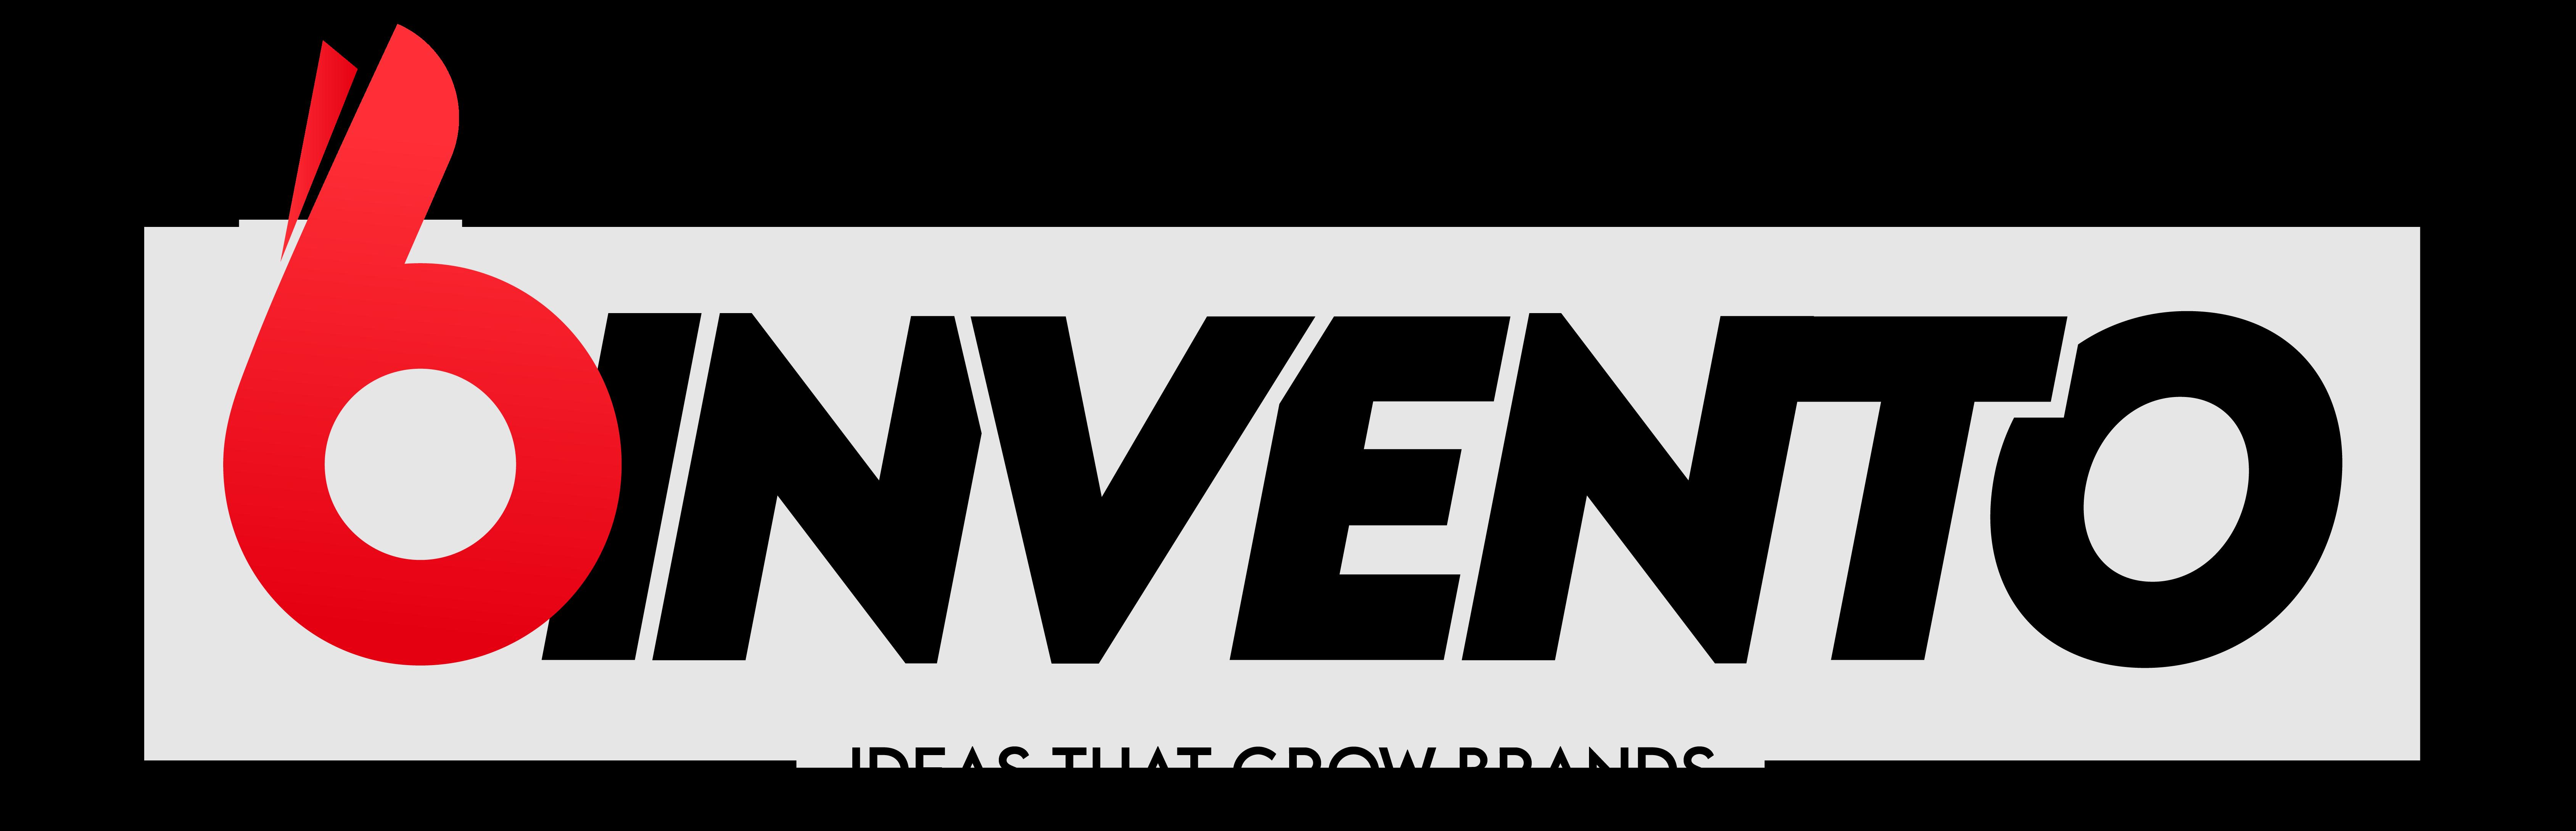 Binvento